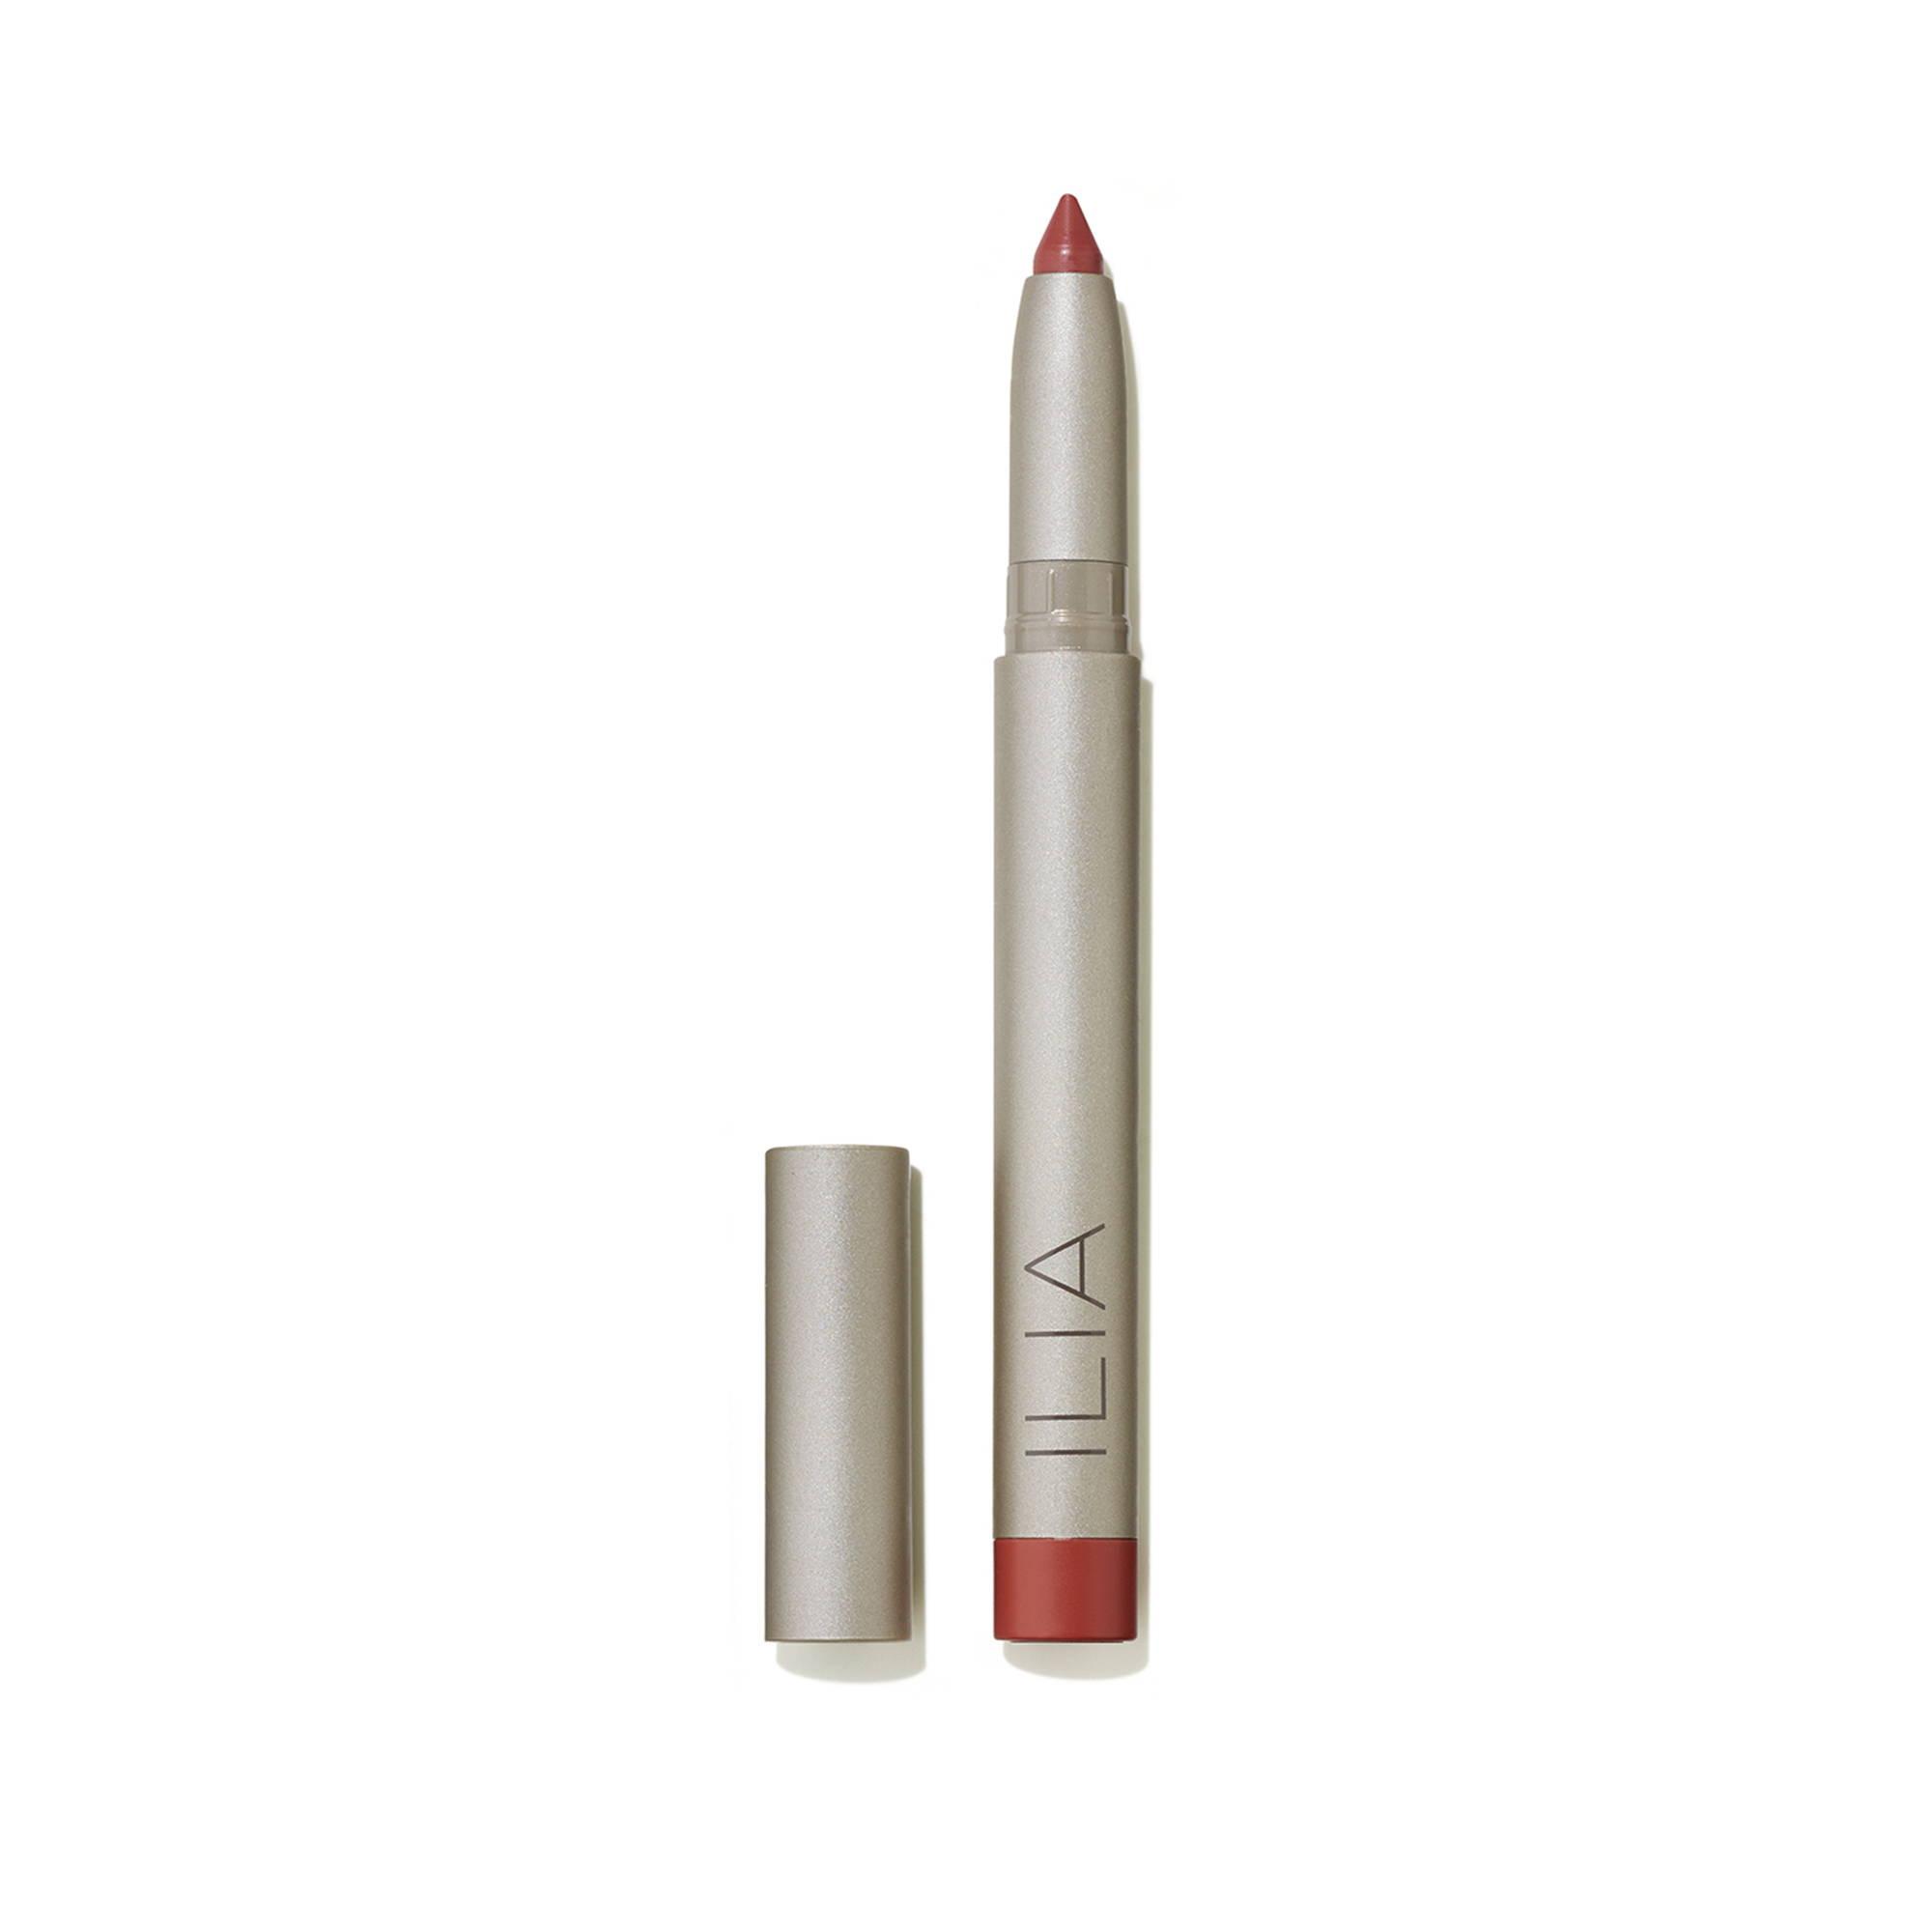 Le Satin Cream Lip Crayon Walk This Way Ilia Beauty